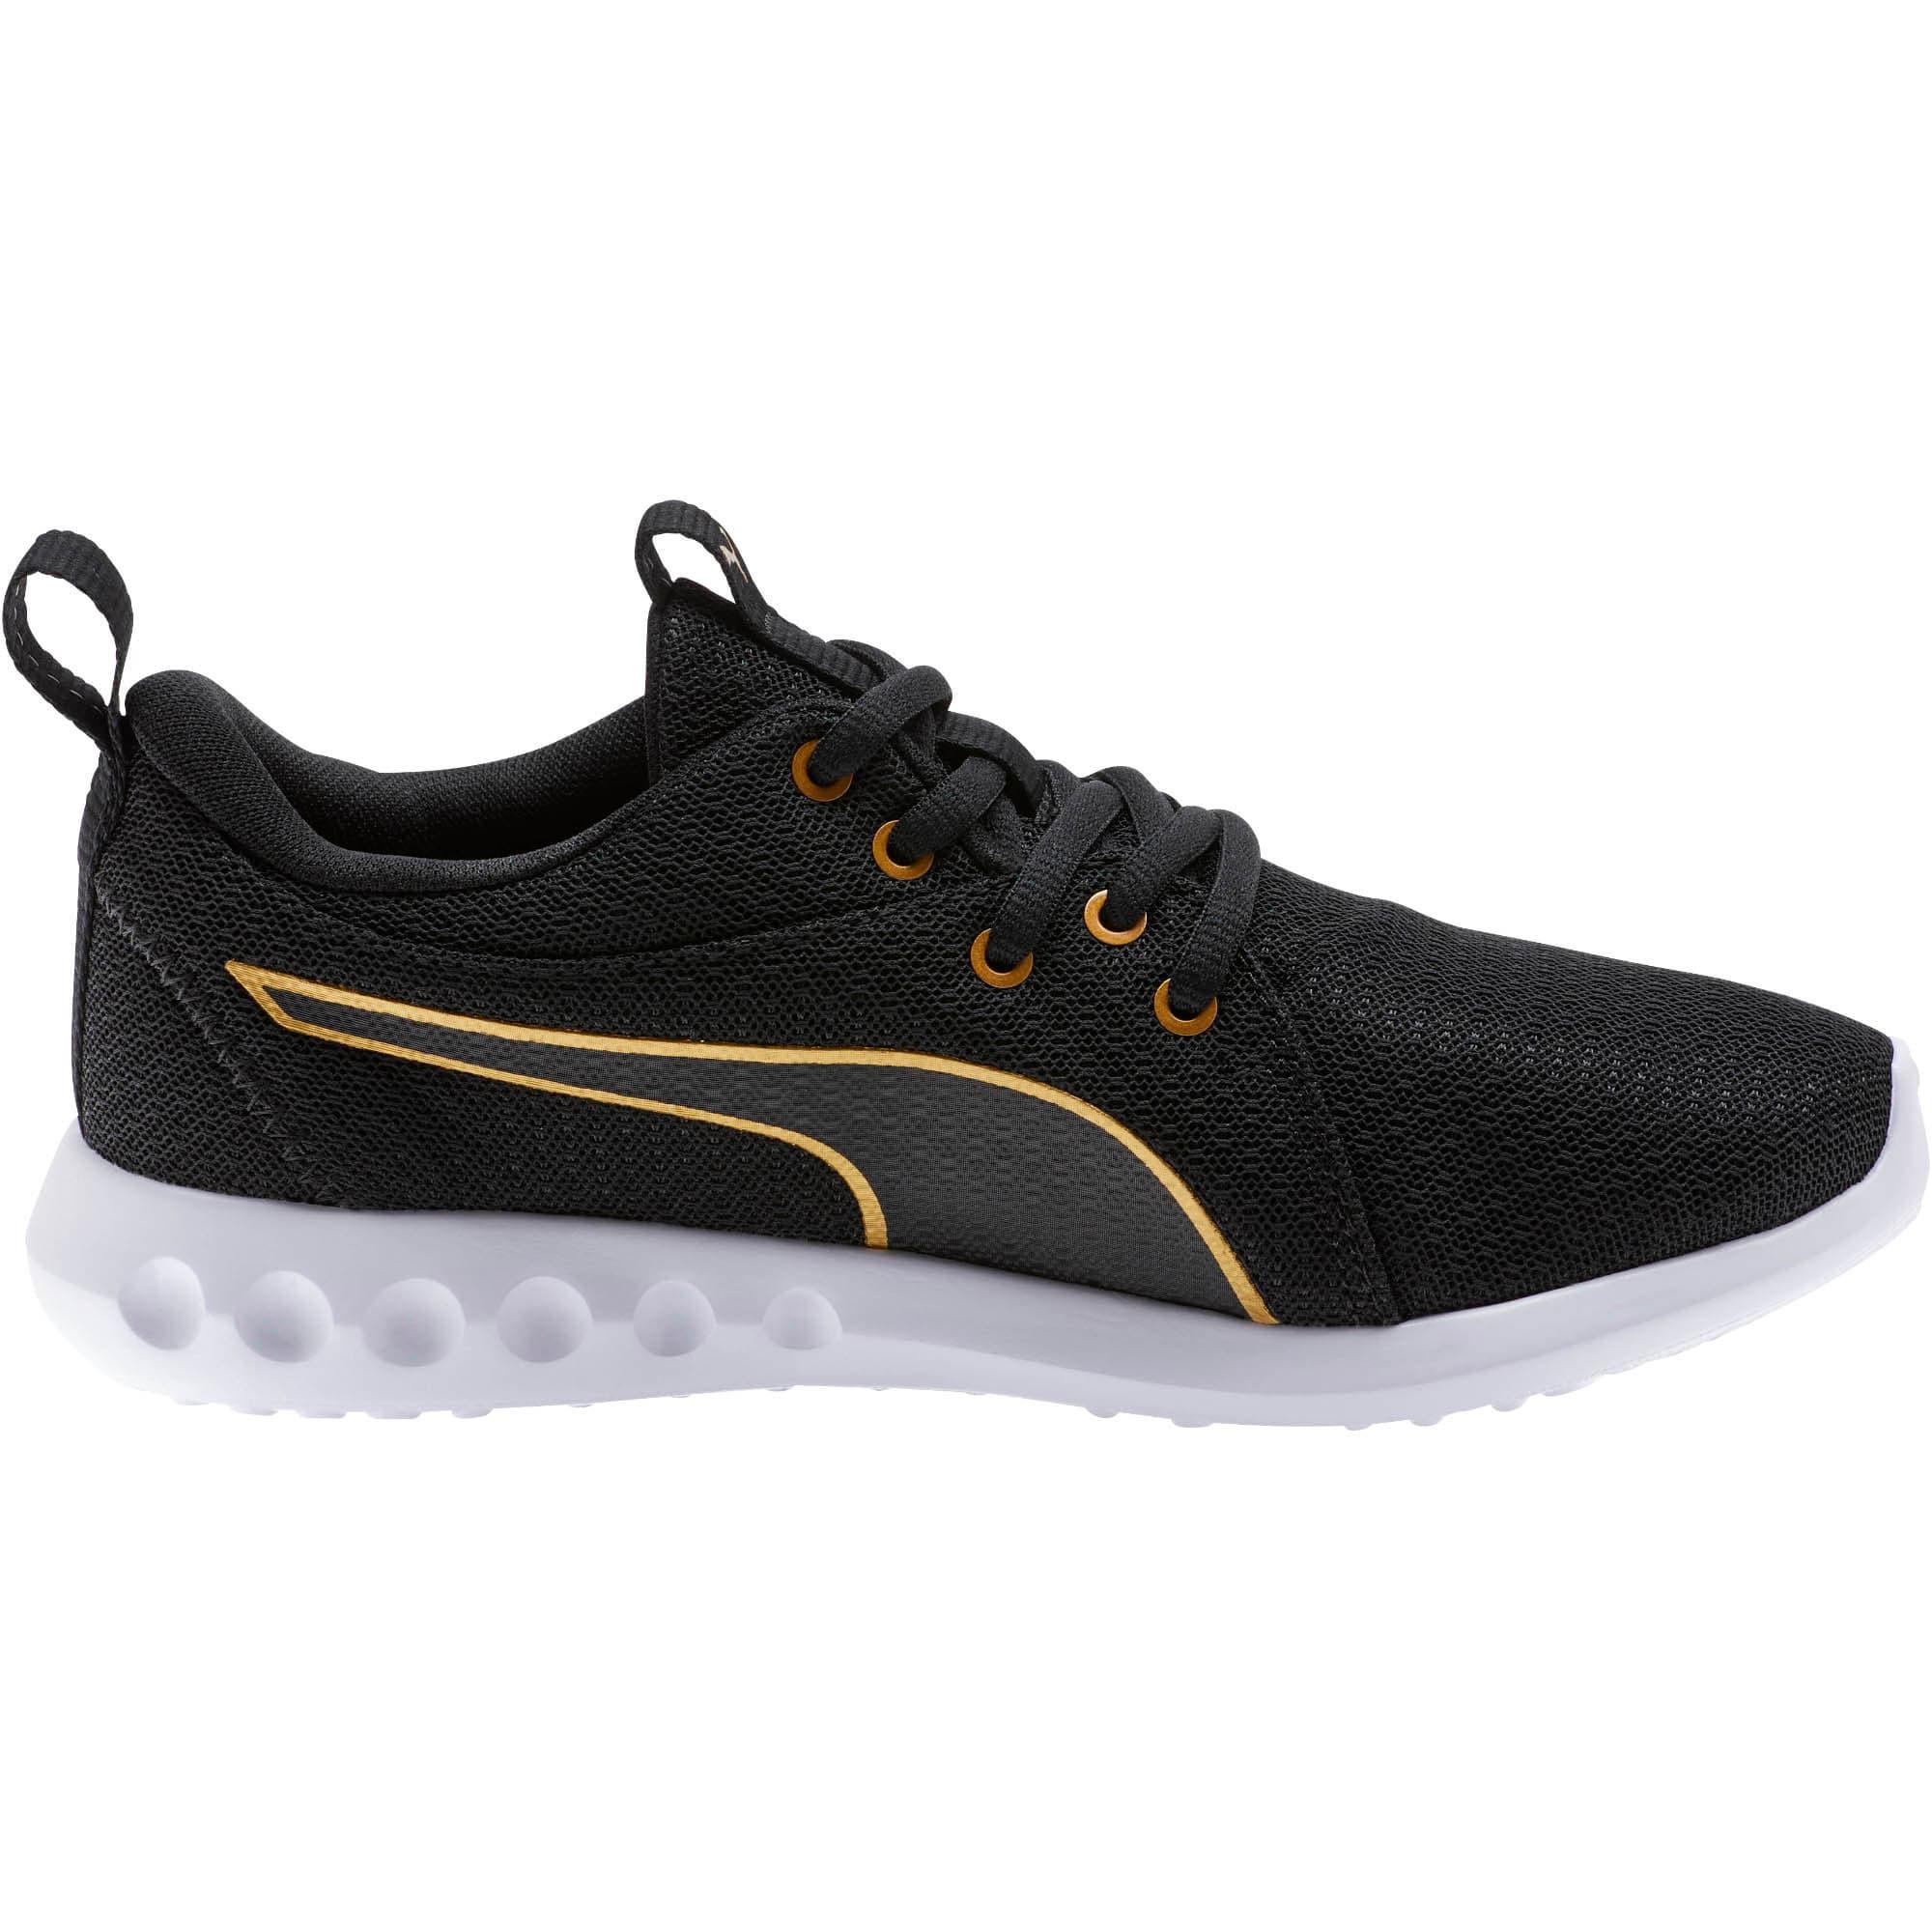 Thumbnail 4 of Carson 2 Metallic Mesh Shoes JR, Puma Black-Gold, medium